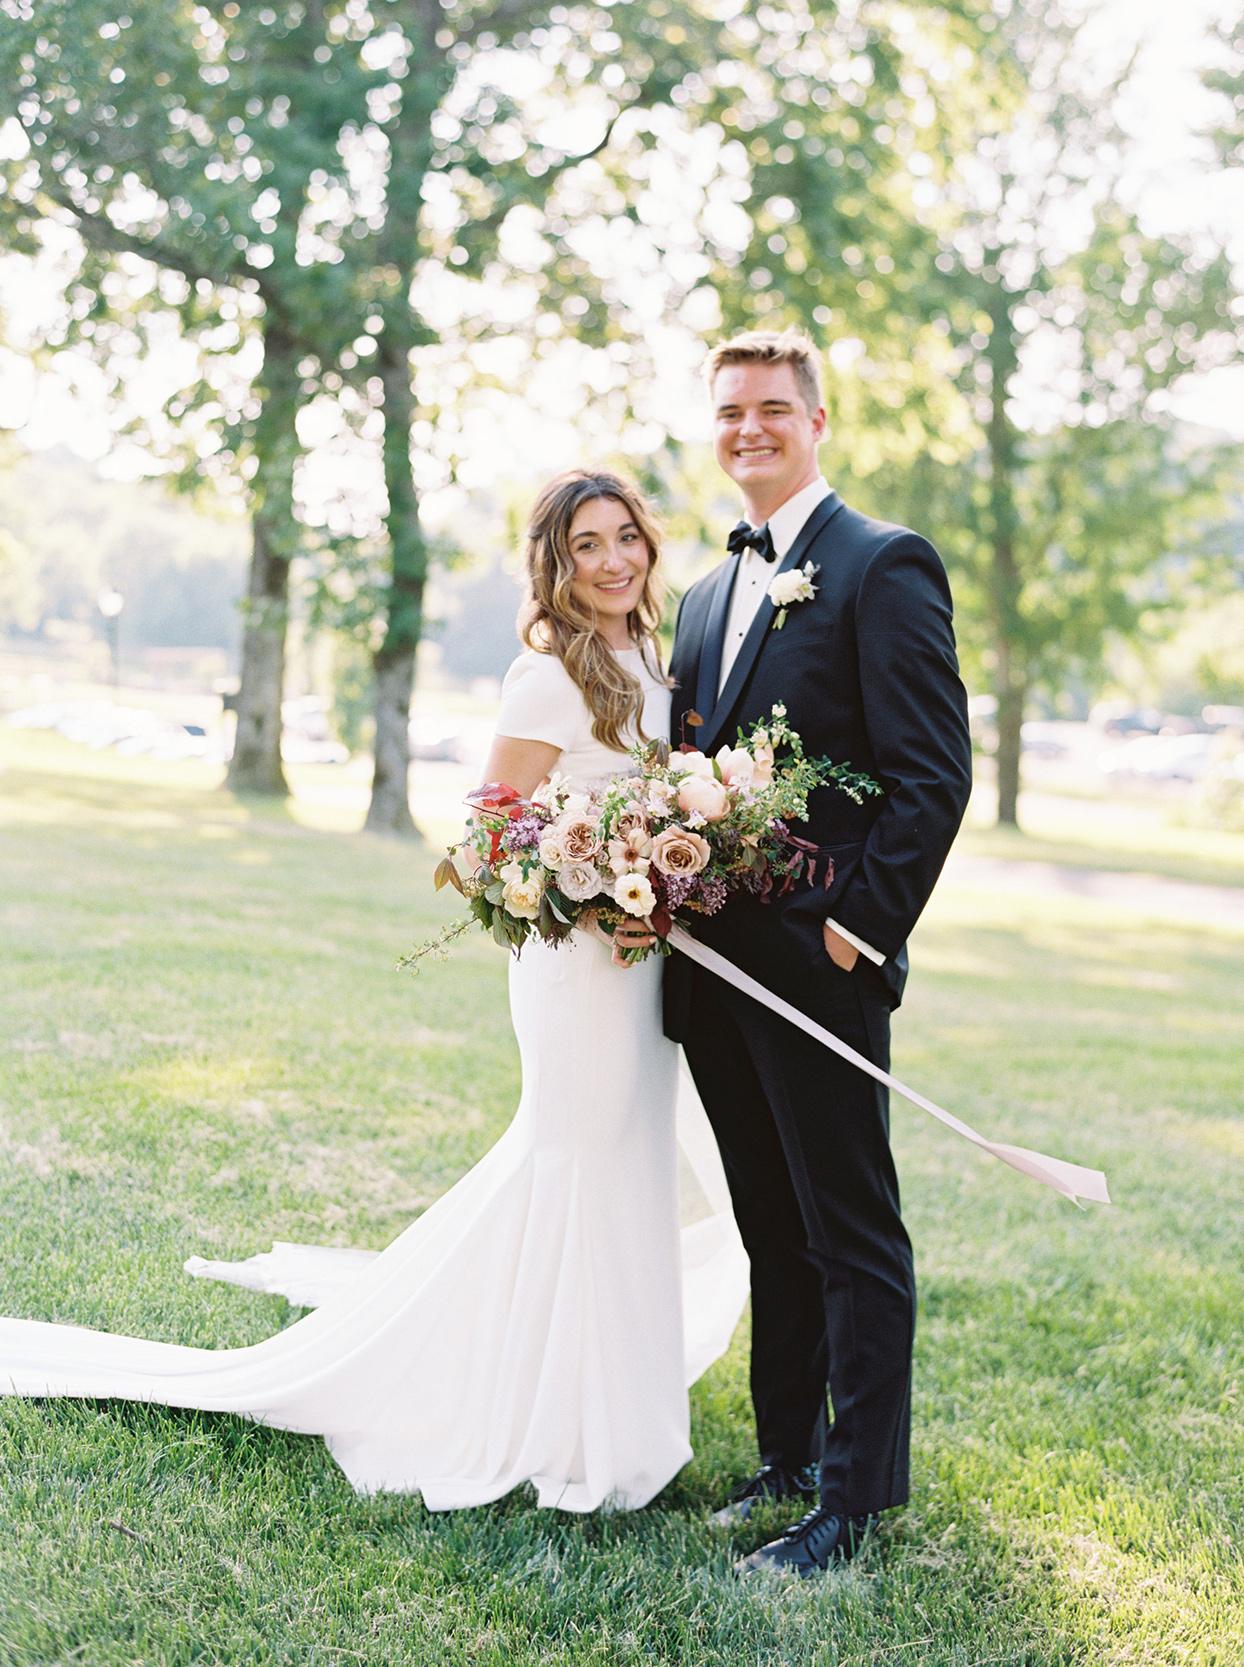 julia doug wedding couple in grass